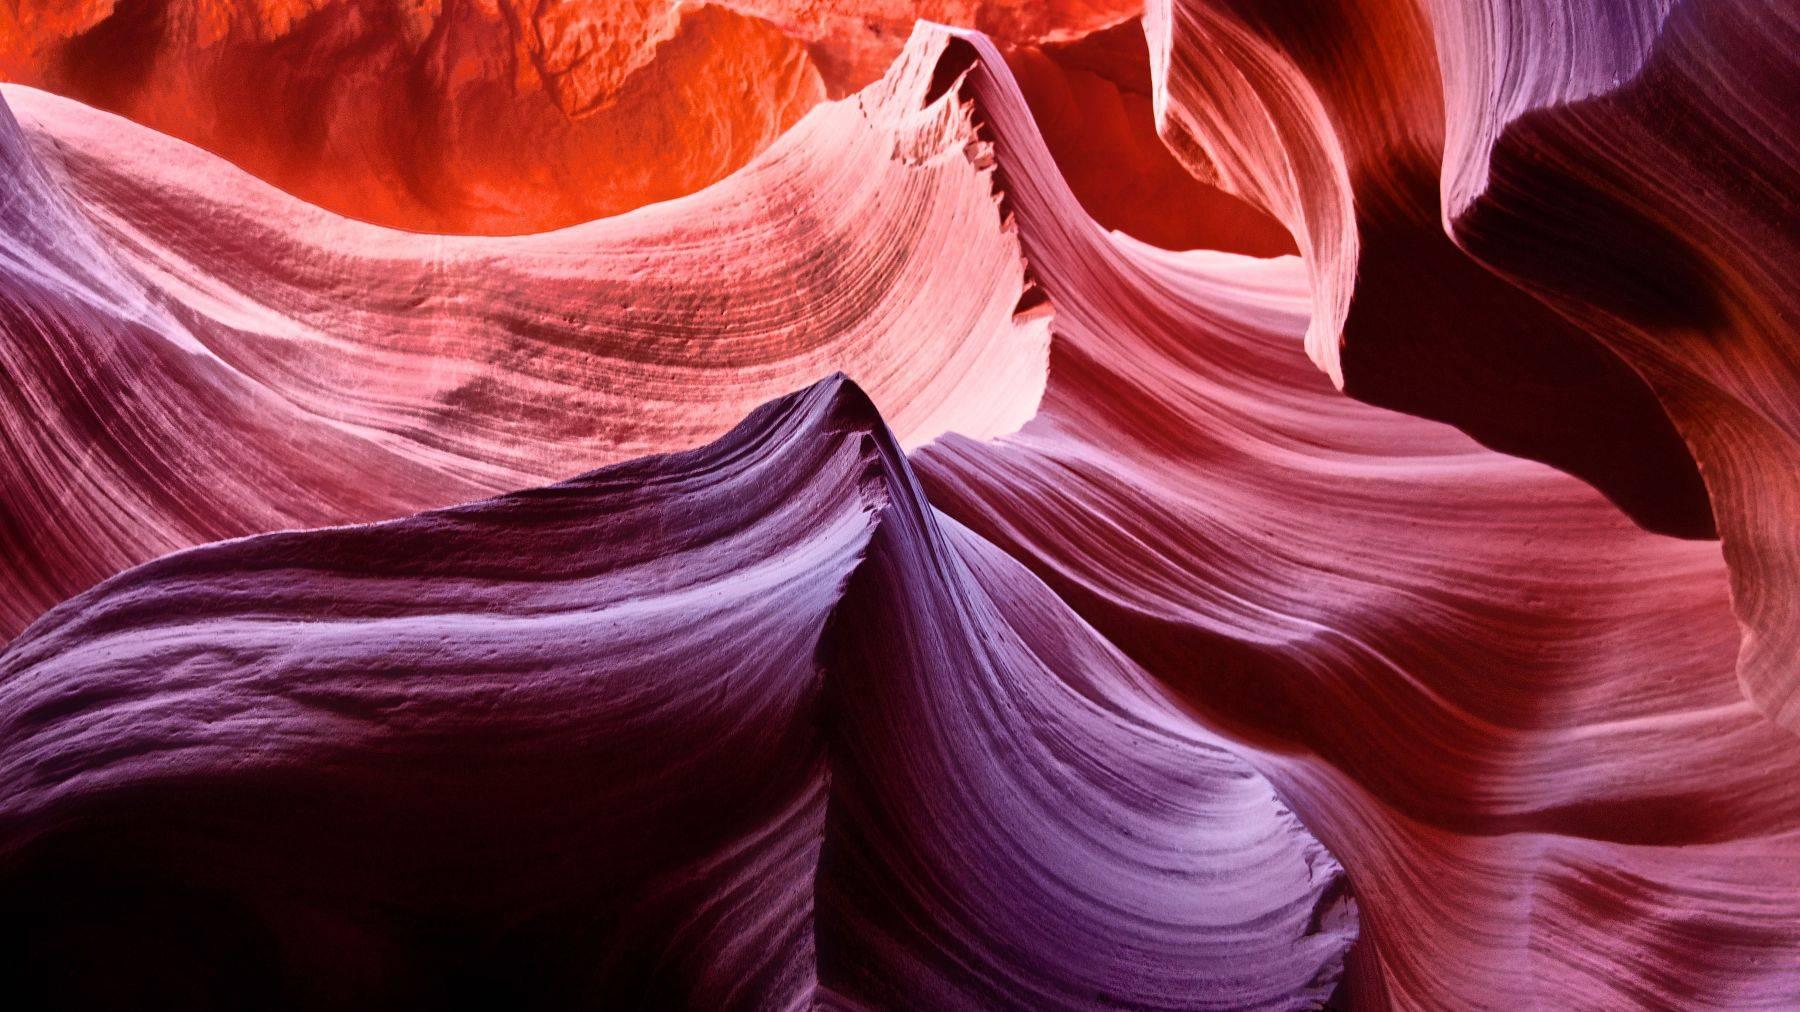 Slot canyons, Arizona